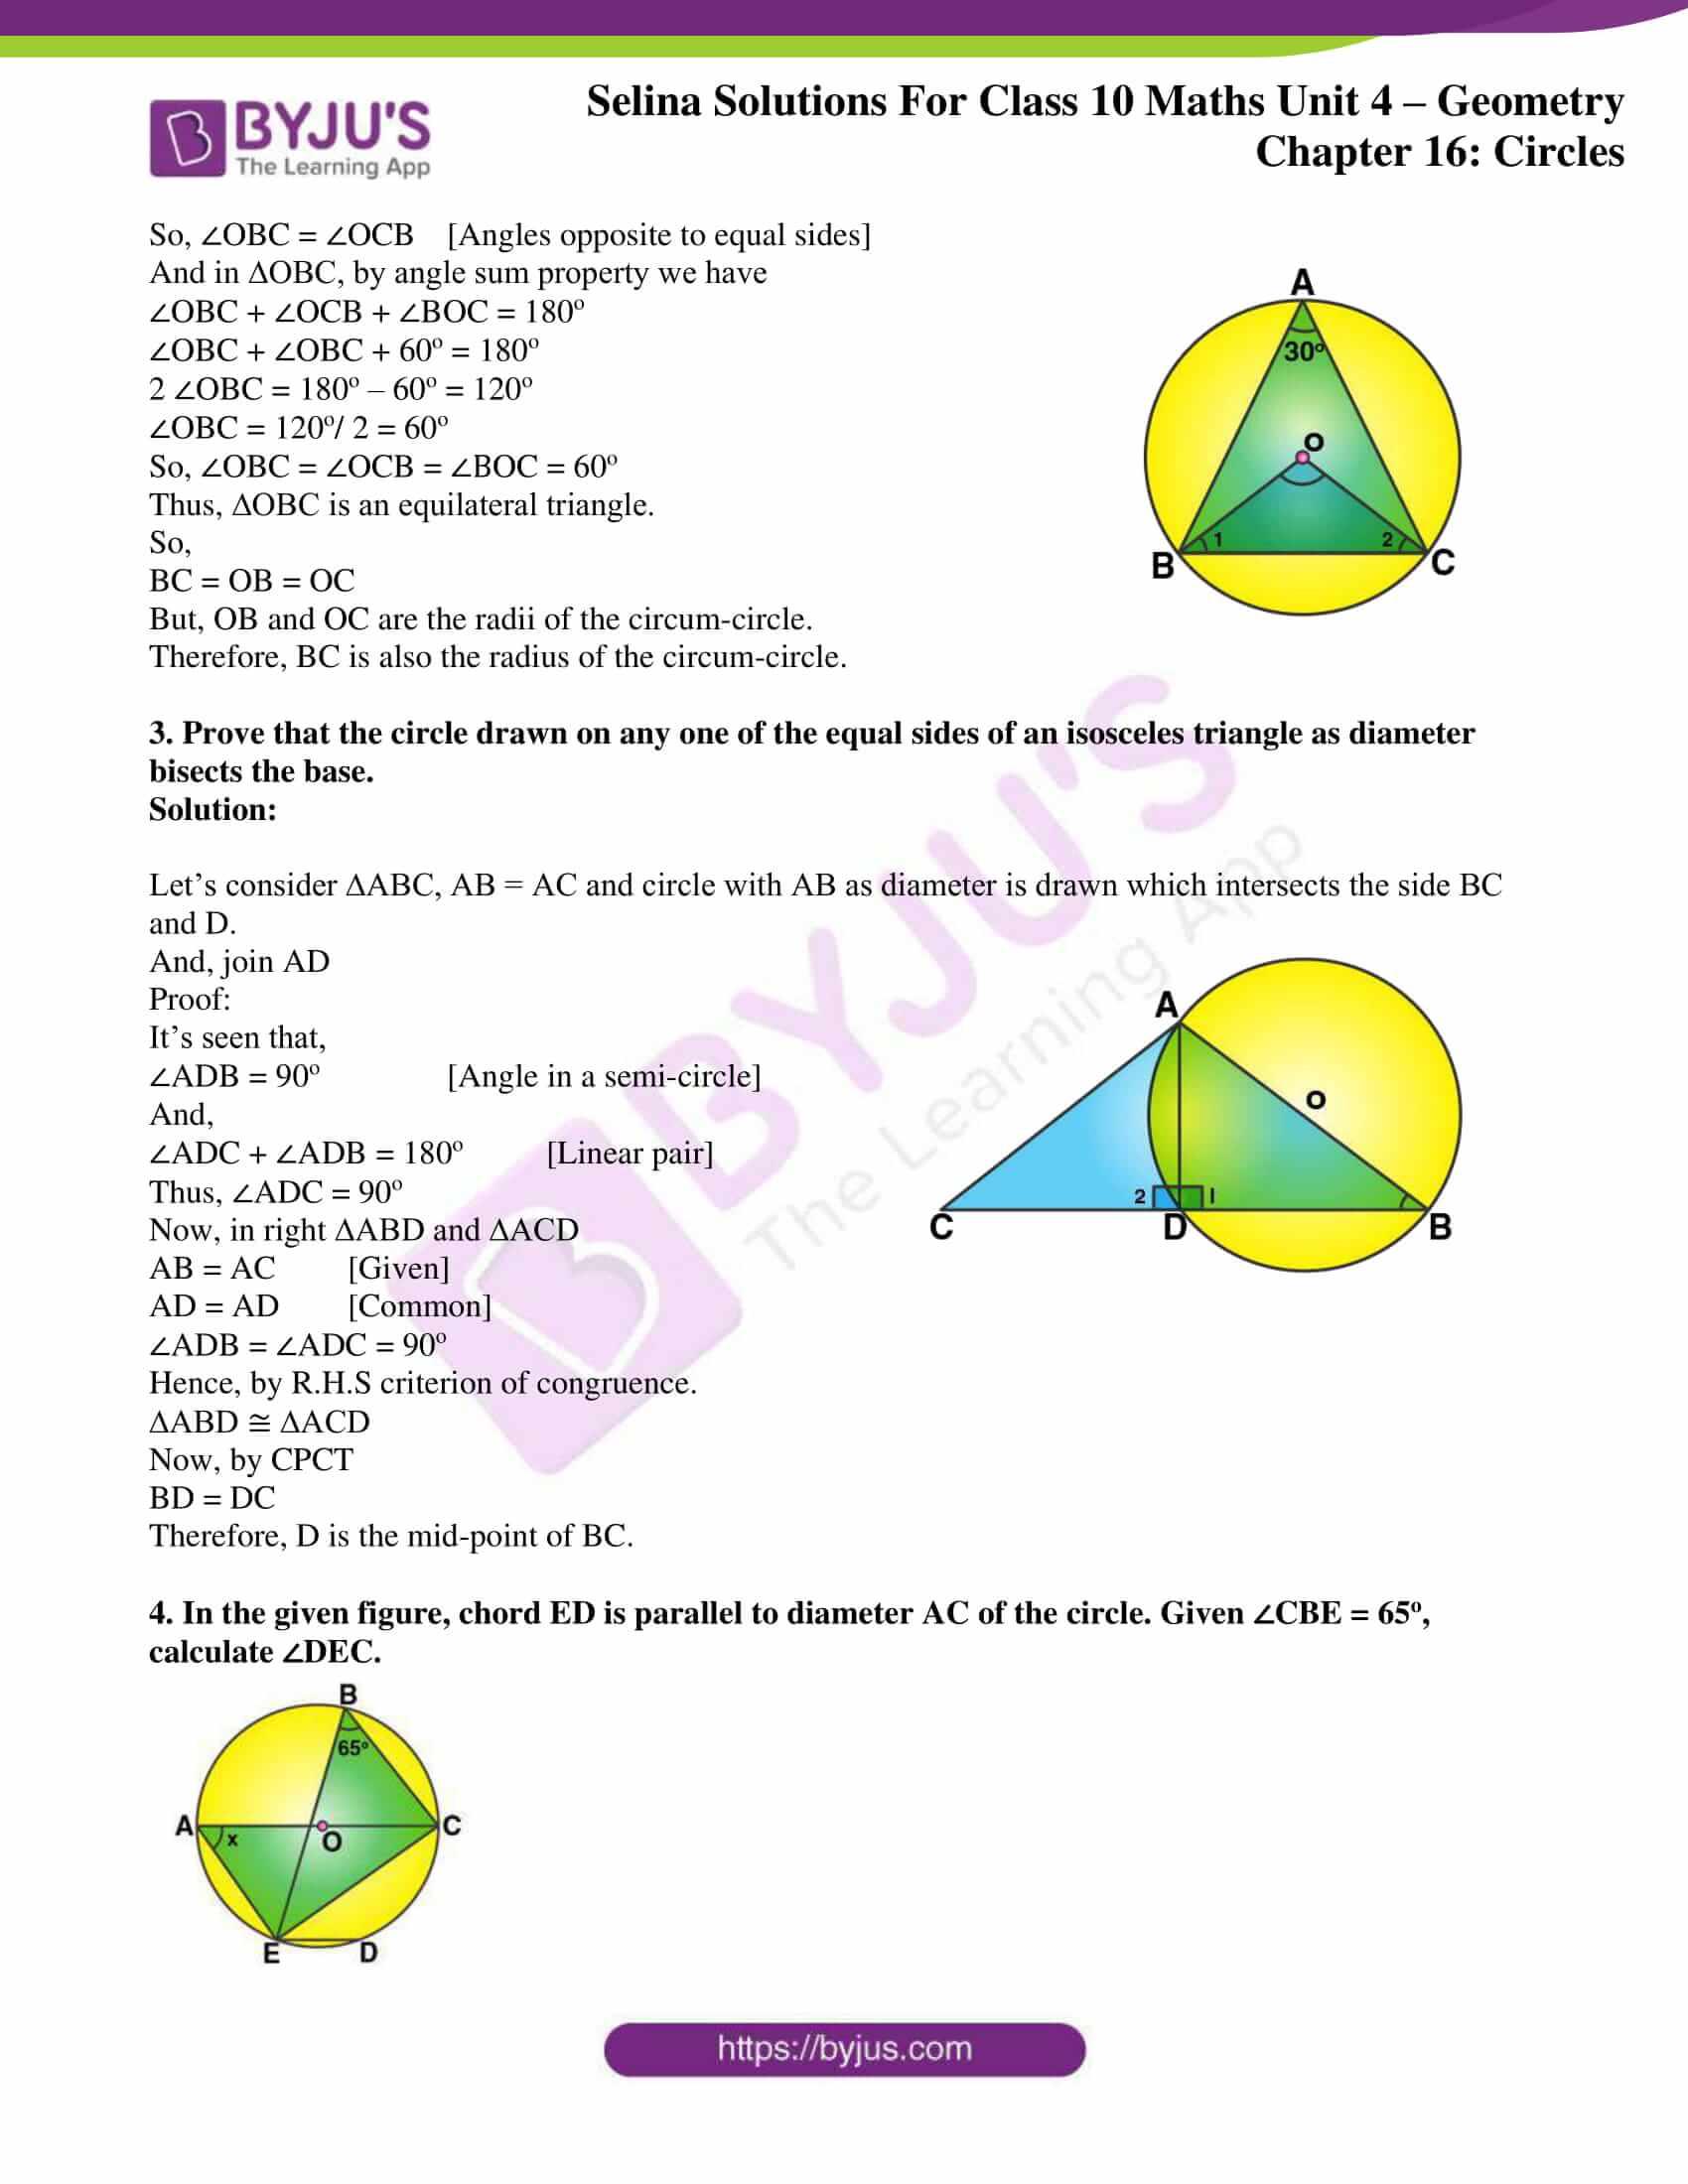 selina-sol-maths-class-10-ch-17-ex-c-2